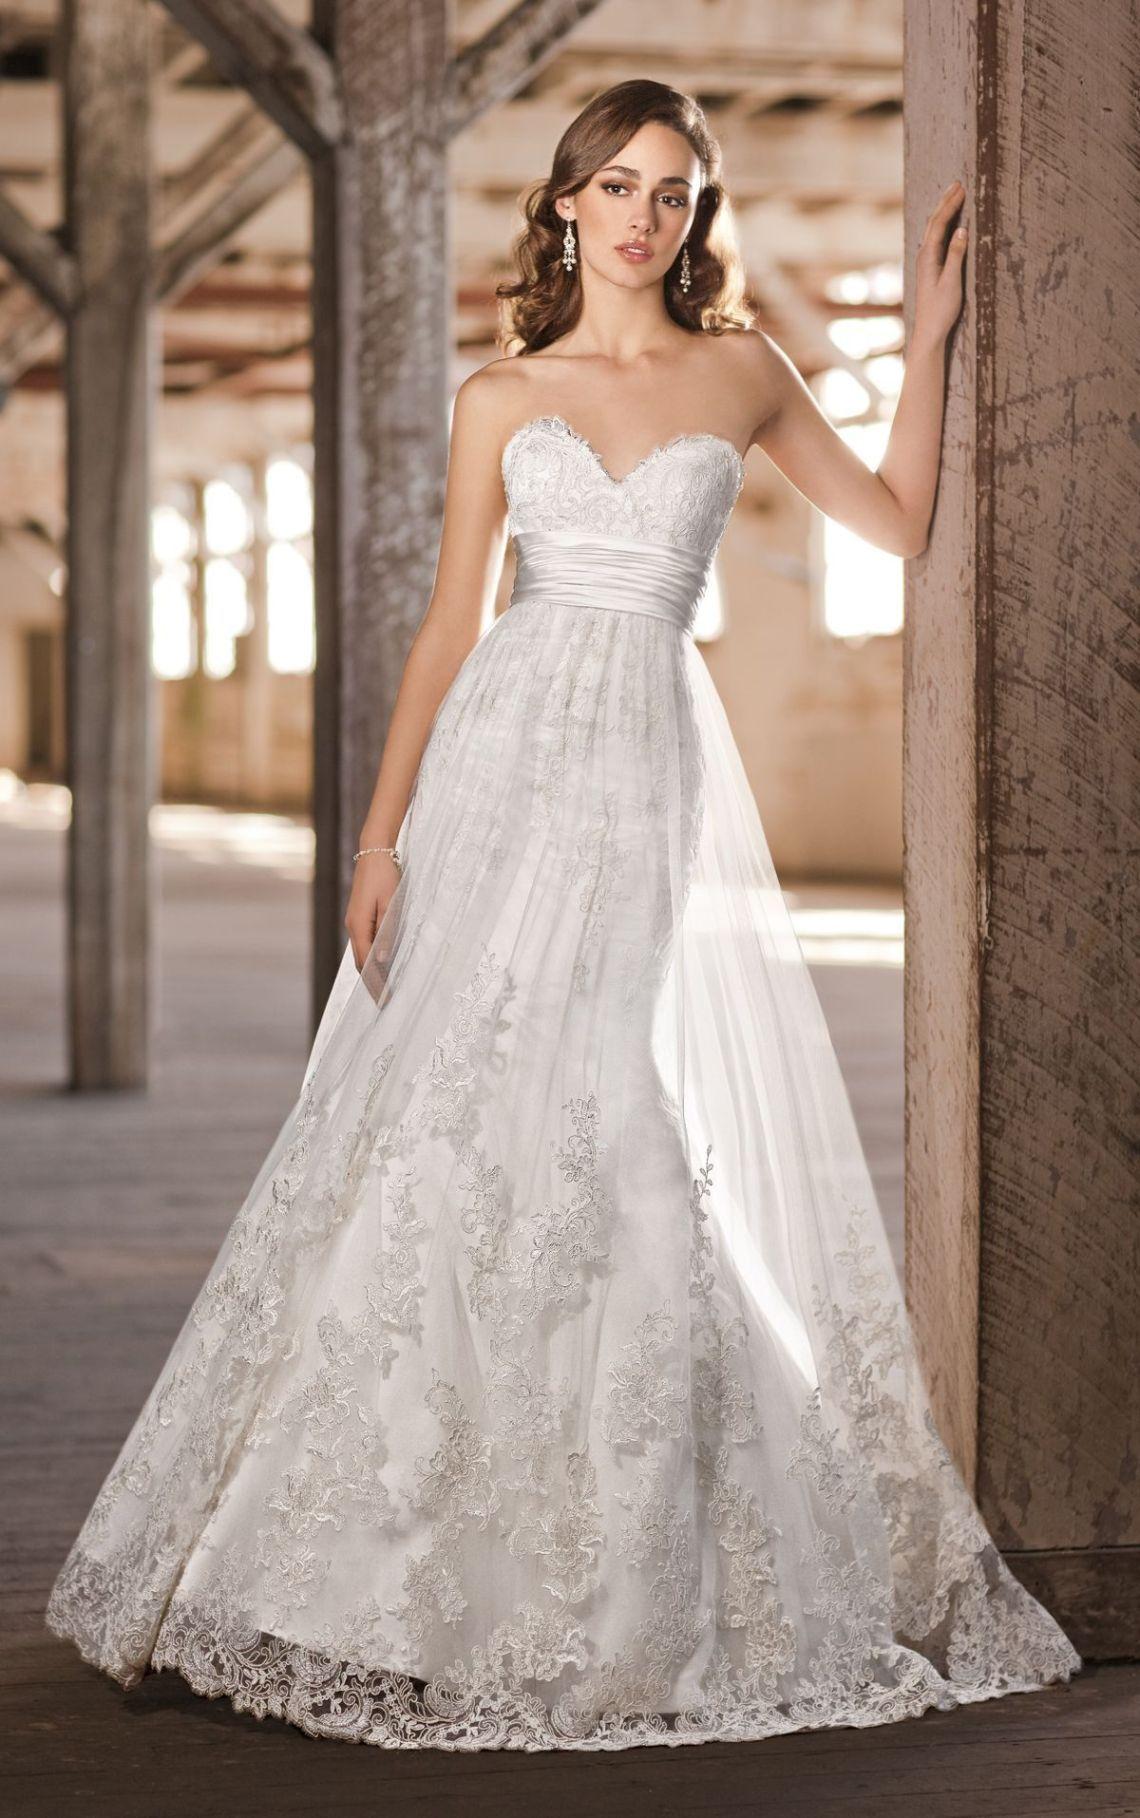 Essense of australia bridal gown style d1266 bridal gown